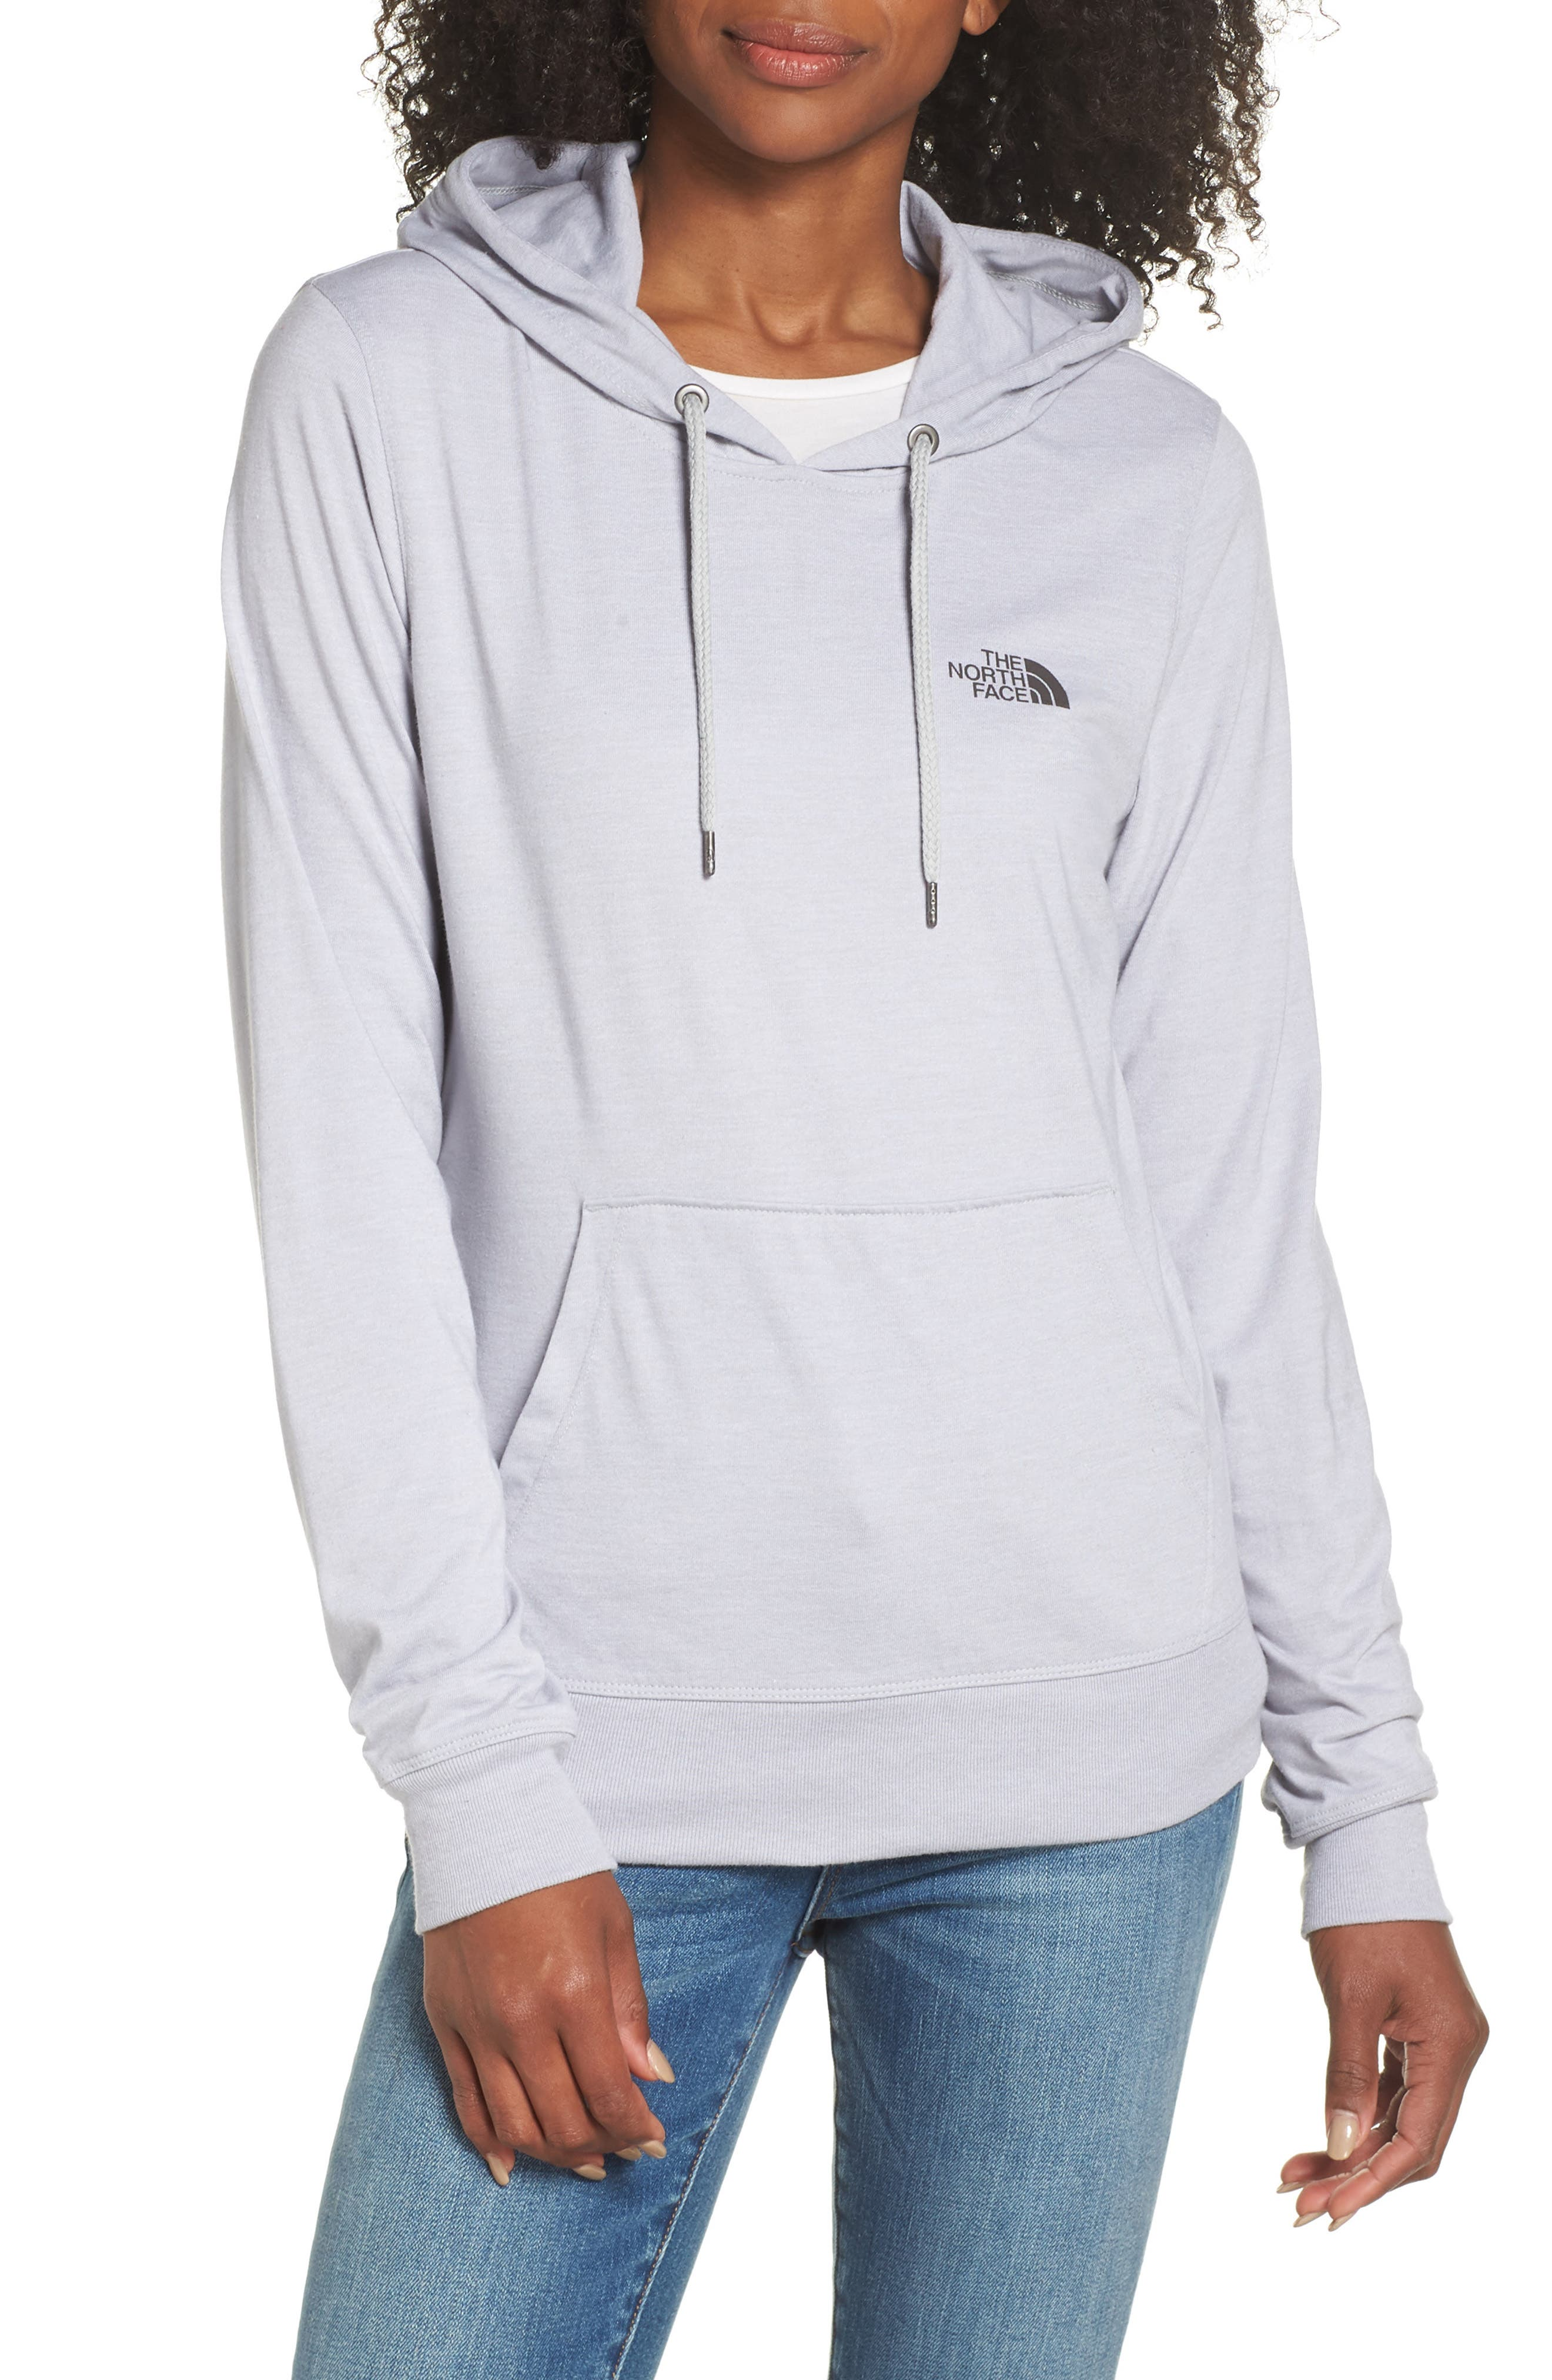 Lightweight Hoodie Sweatshirt,                             Main thumbnail 1, color,                             TNF LIGHT GREY HEATHER